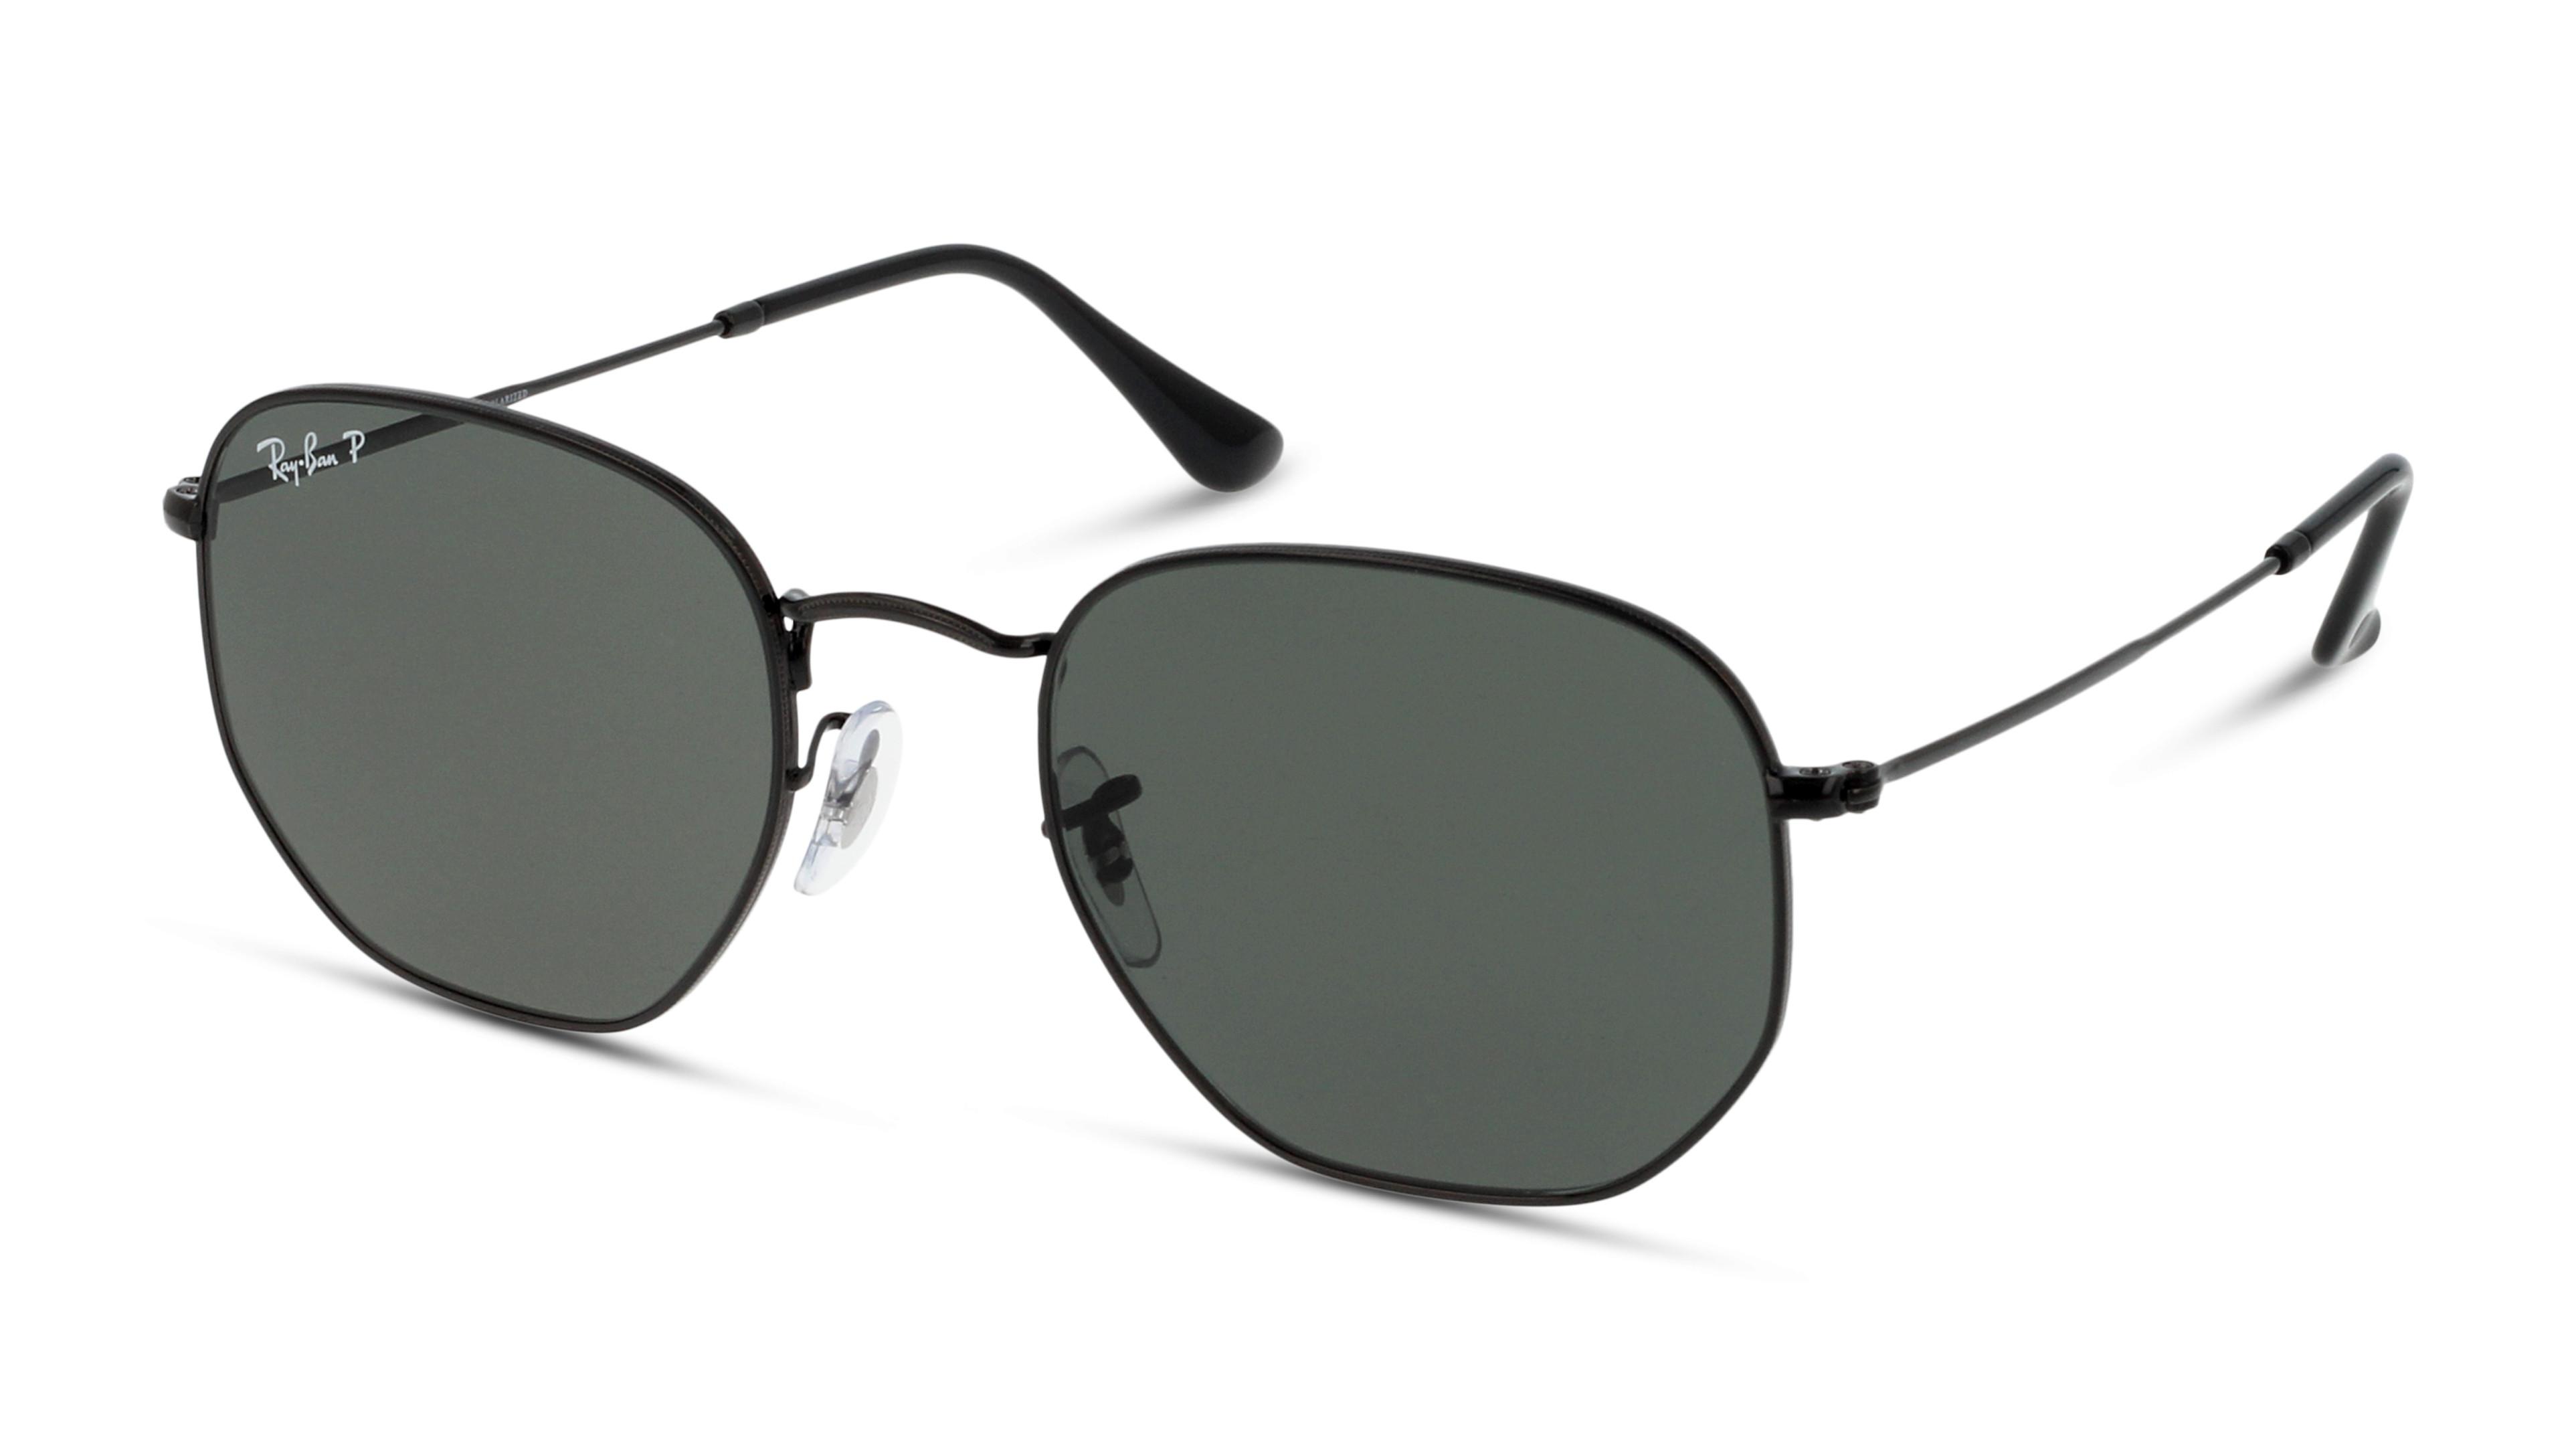 8053672743869-angle-01-rayban-glasses-eyewear-pair